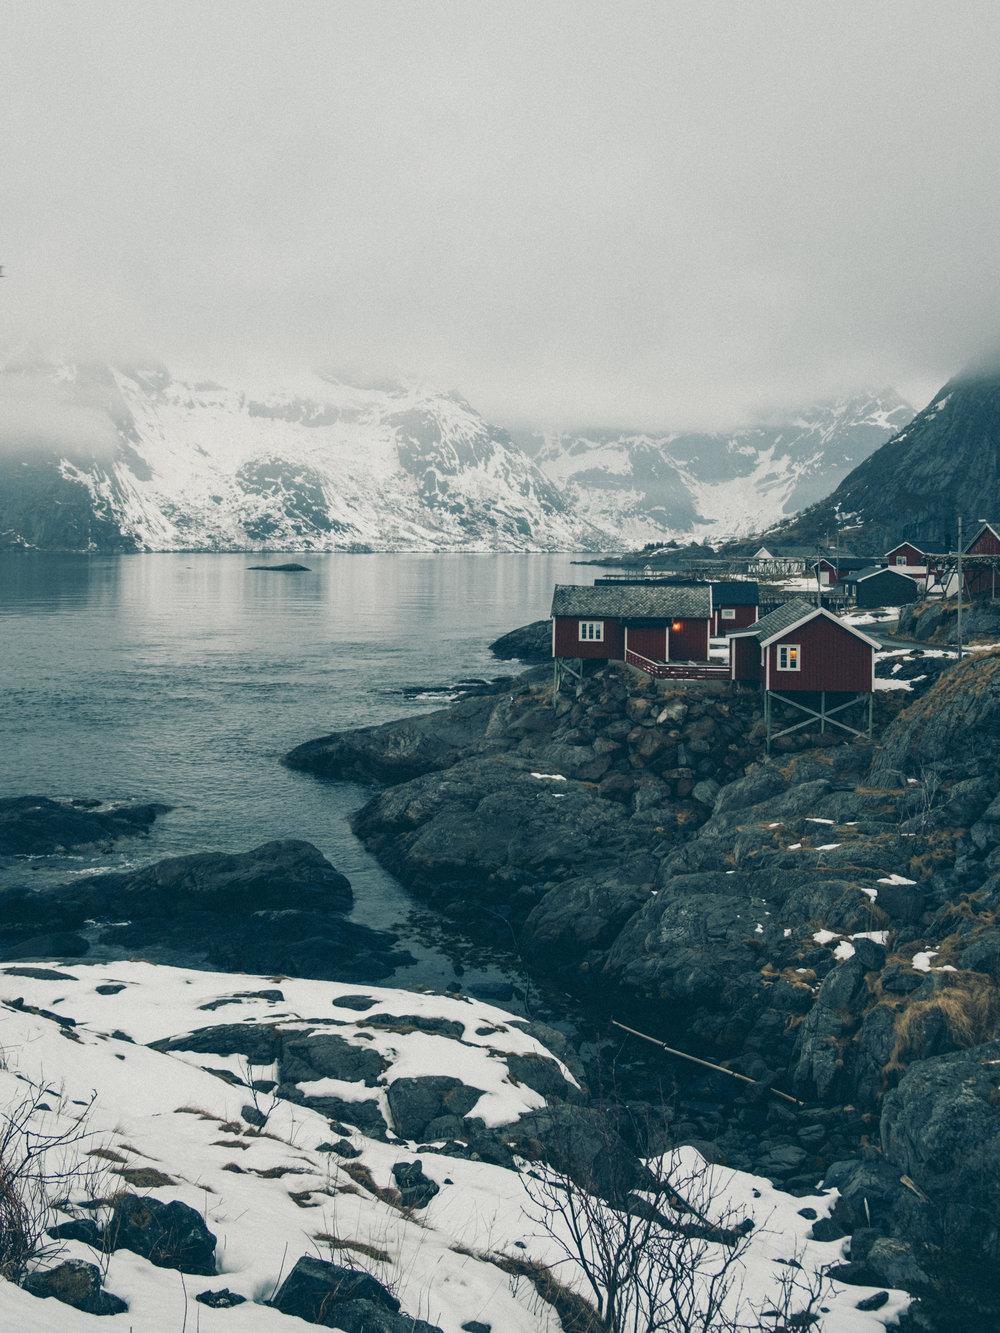 rorbuer-fishing-lofoten-islands